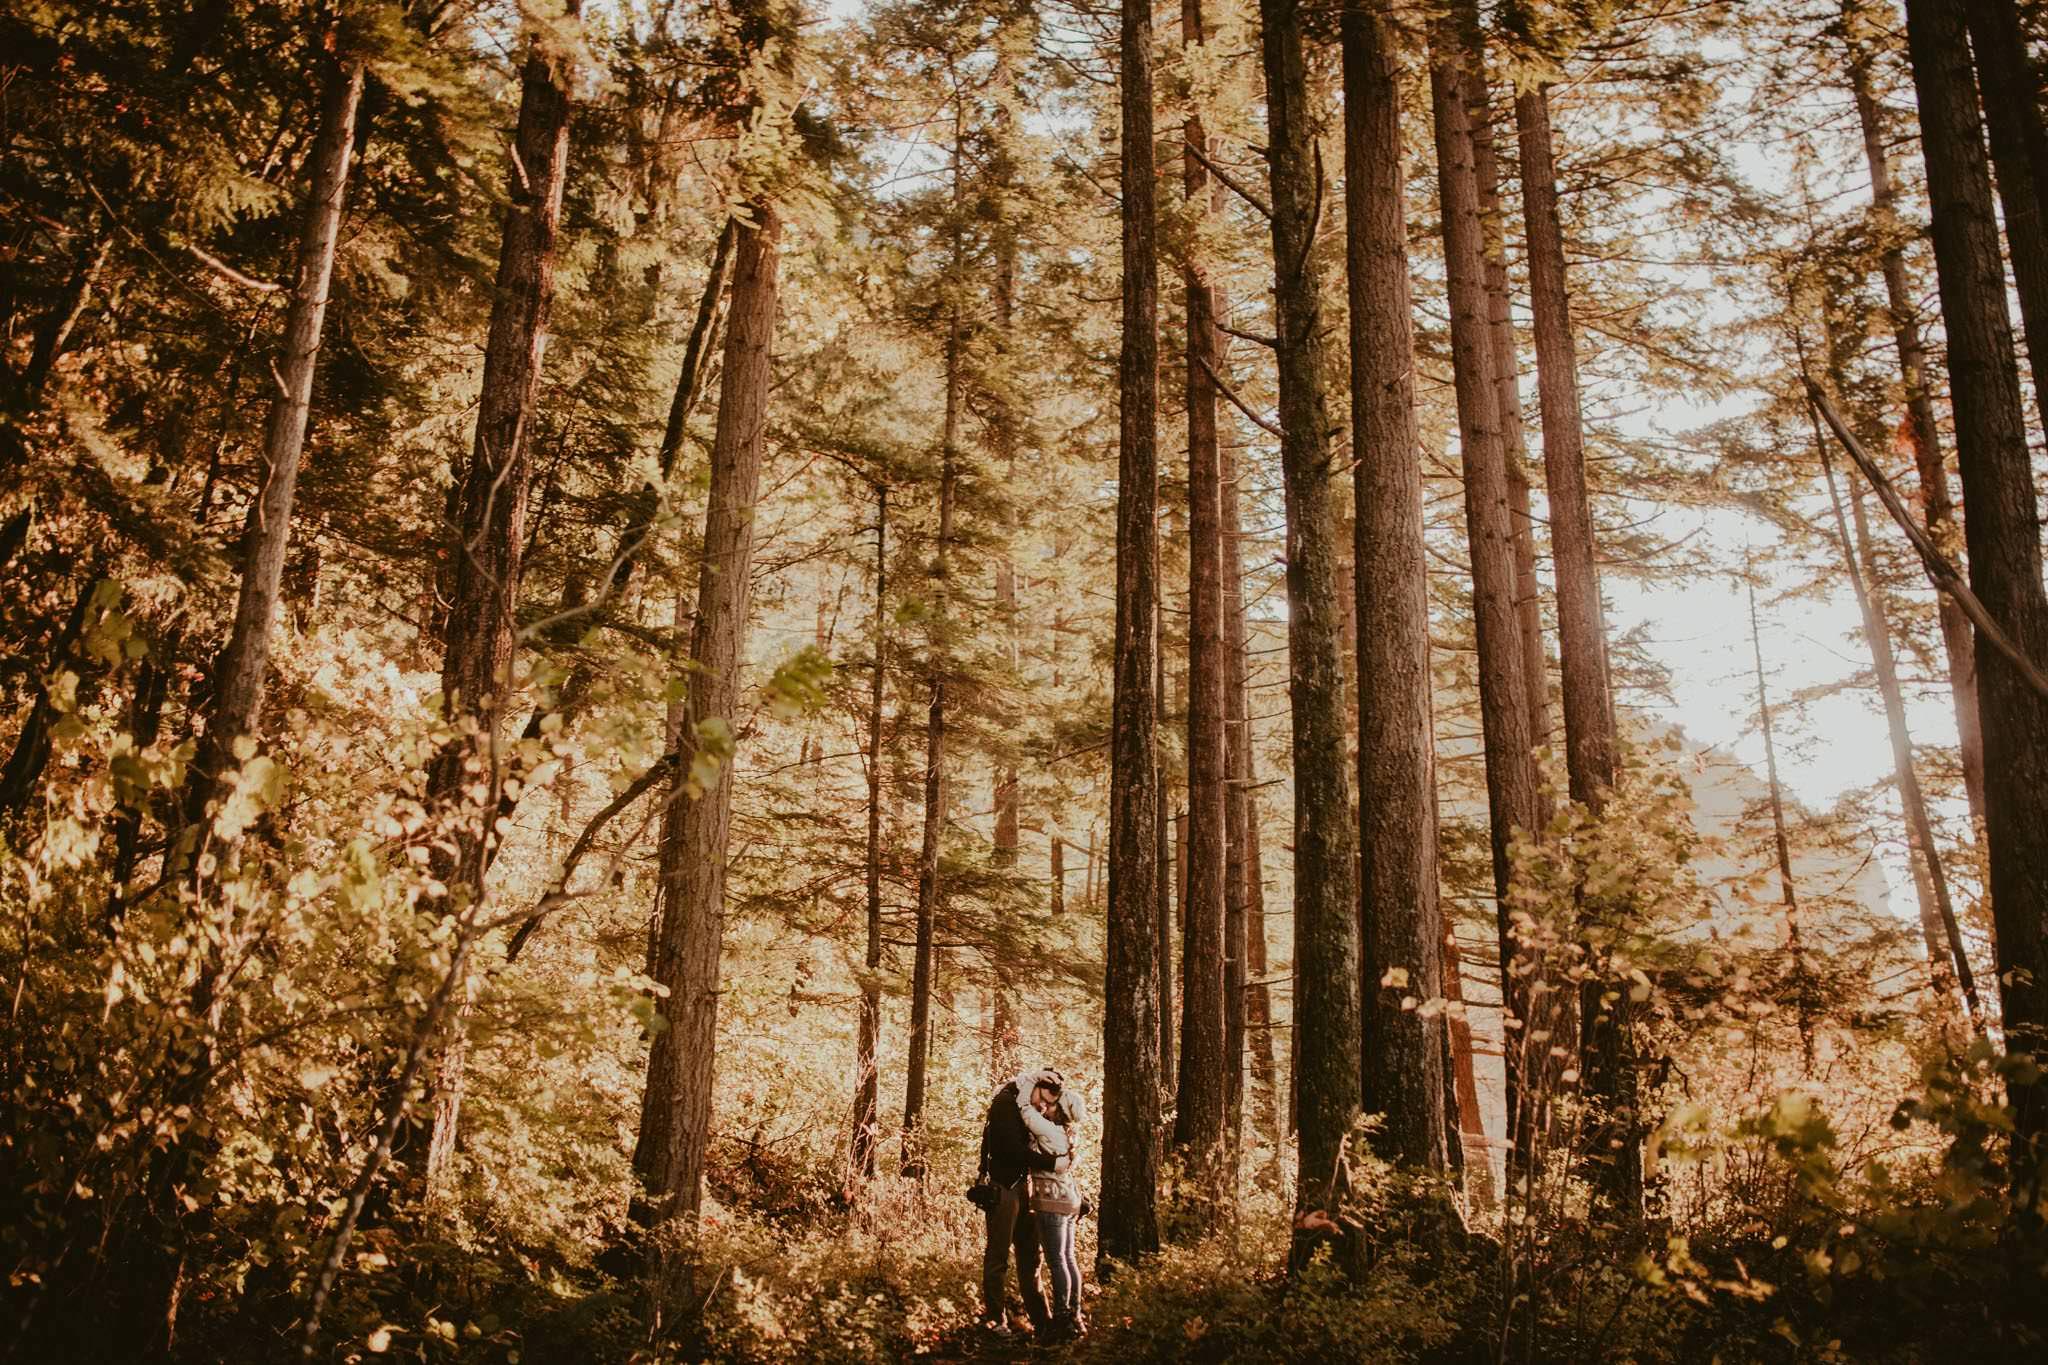 oregon-wedding-elopement-photographer-donmashelen-bringas12